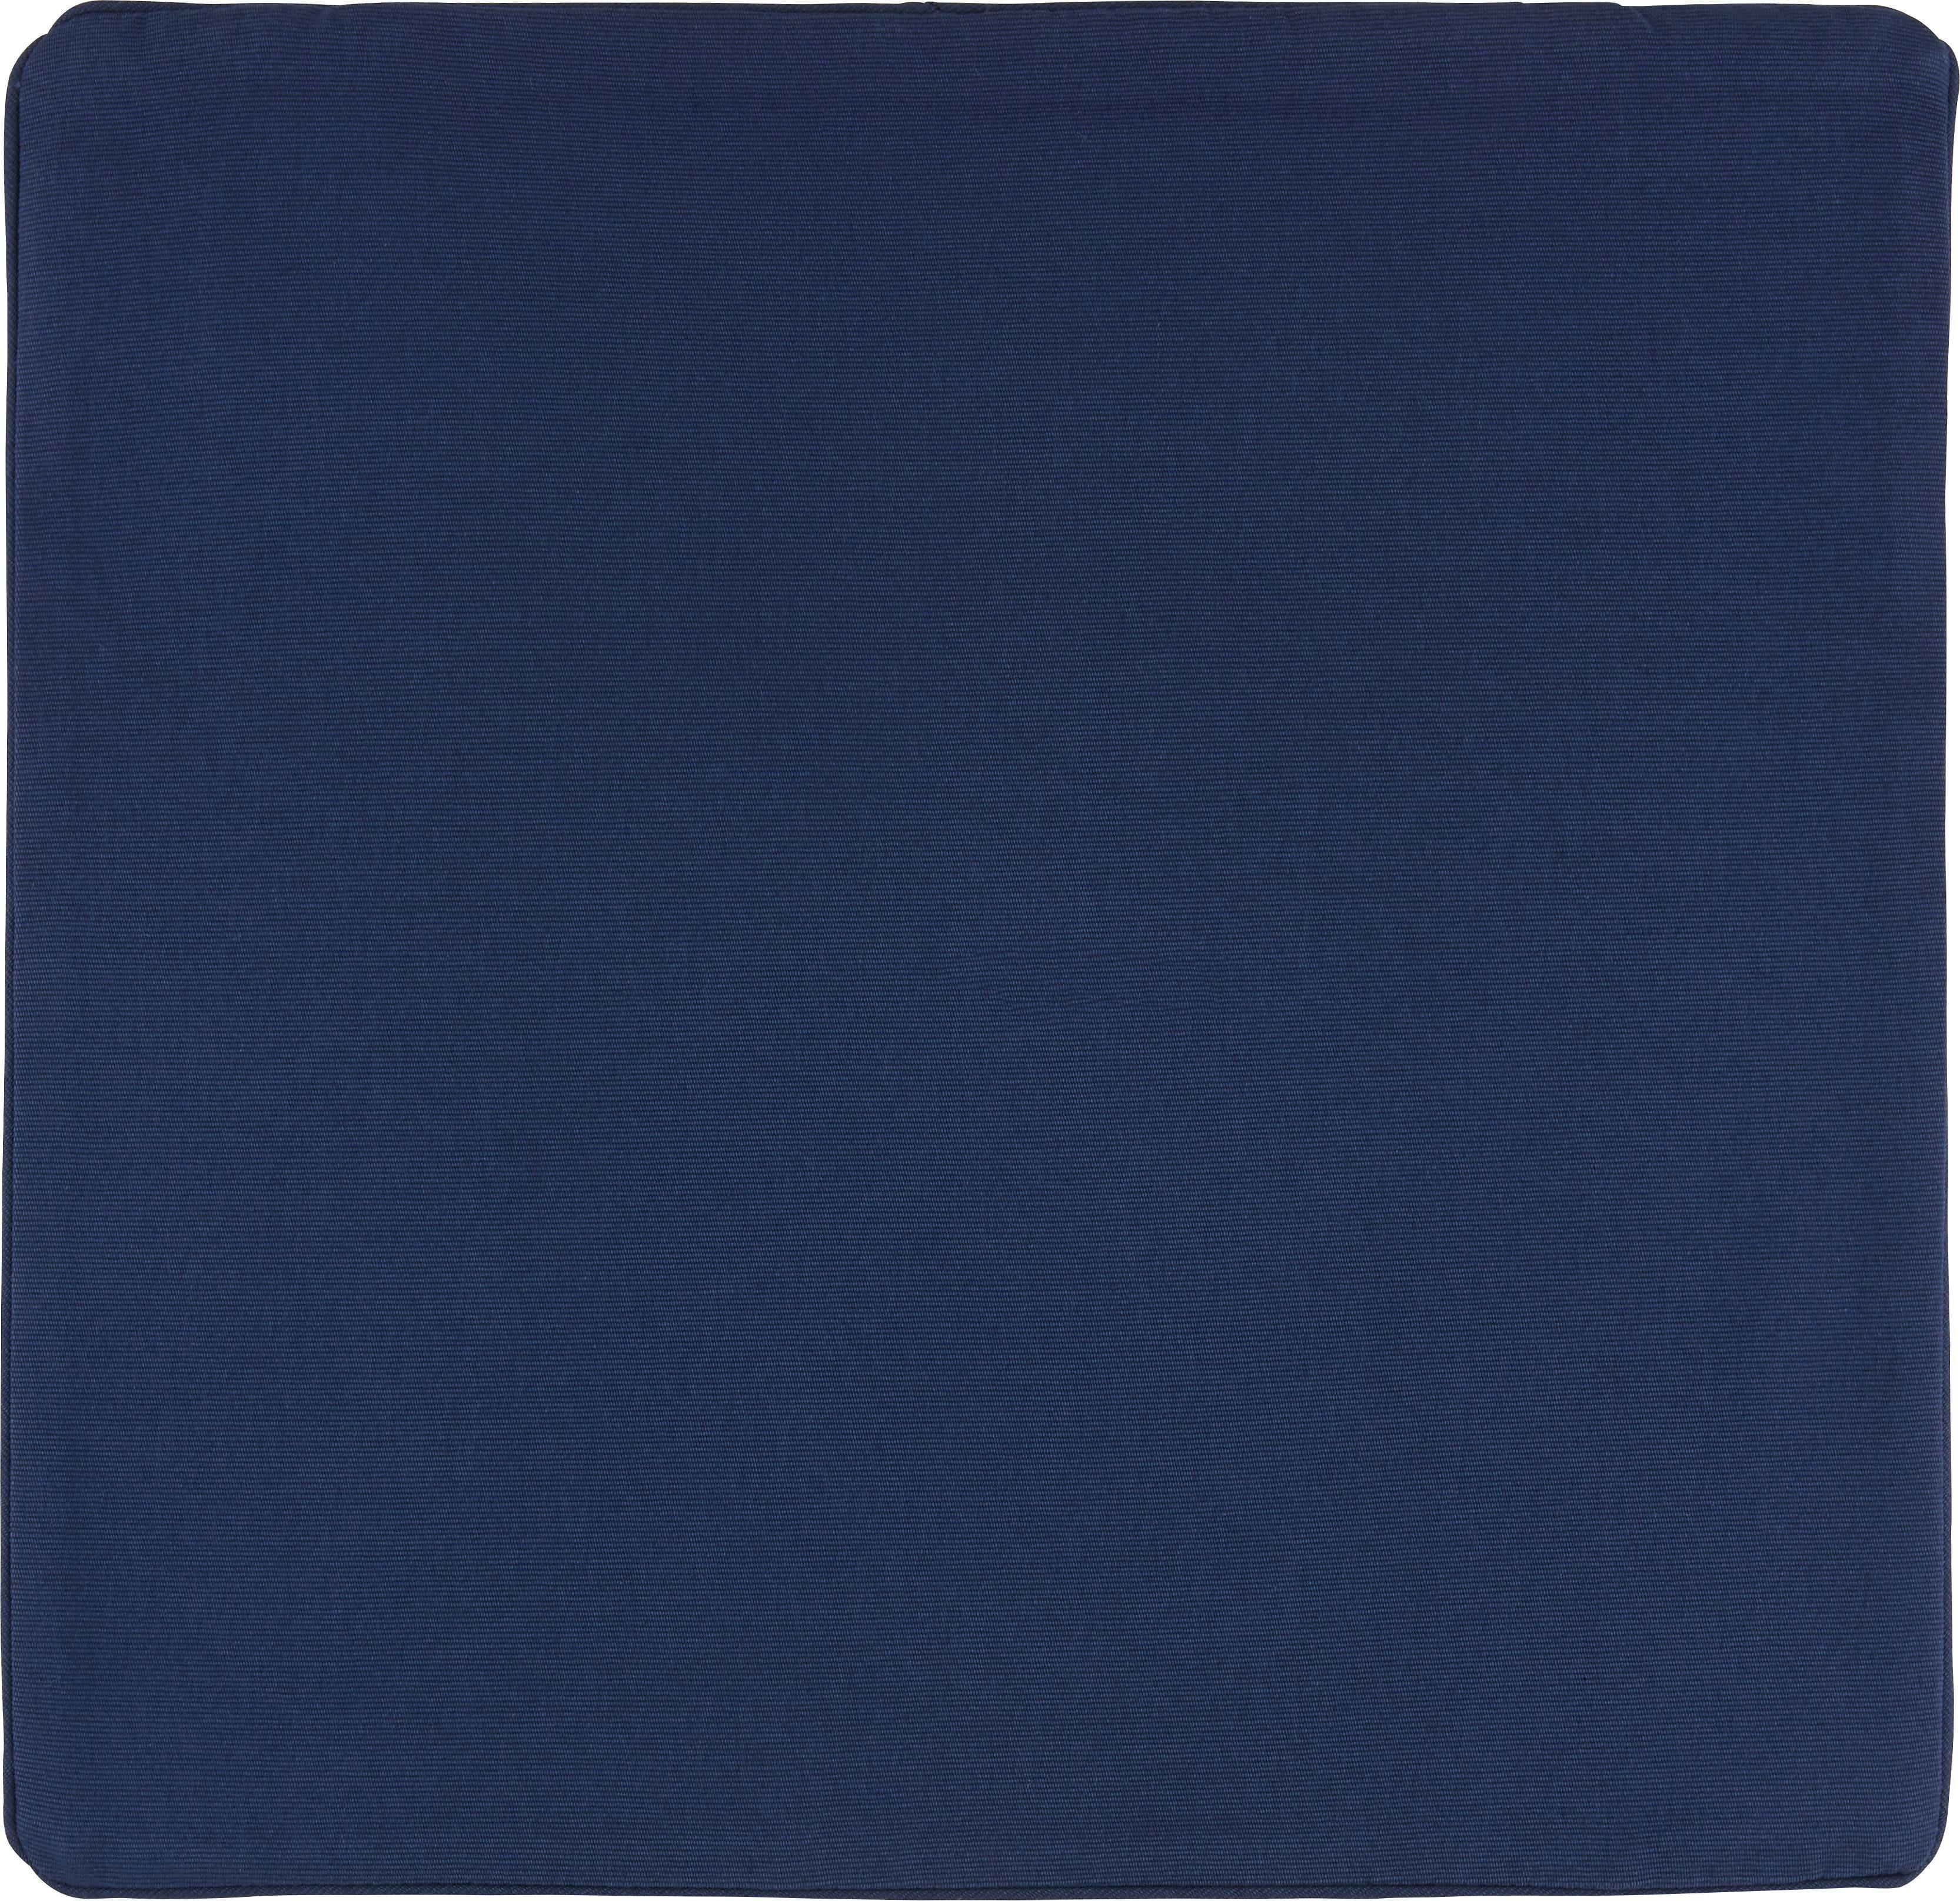 Povlak Na Polštář Steffi Paspel - tmavě modrá, textil (40/40cm) - MÖMAX modern living